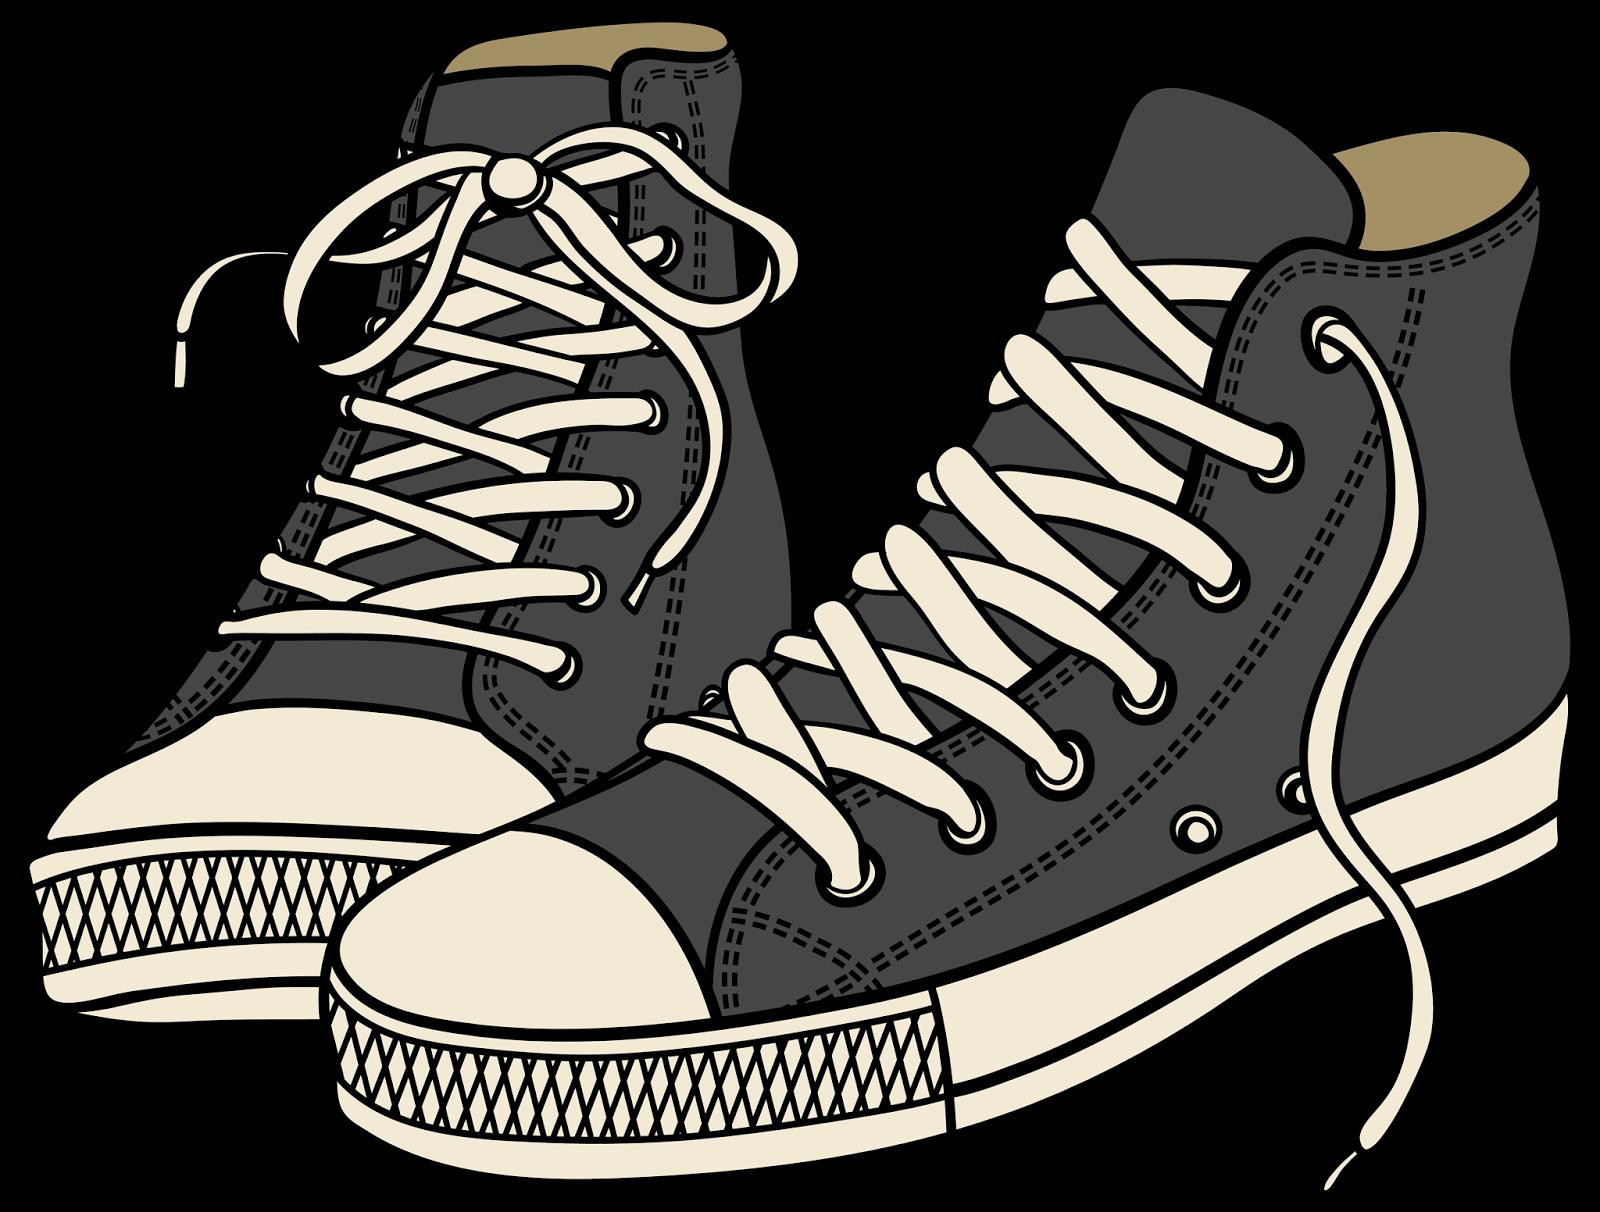 vector Boots clipart tennis shoe. Sneakers converse air jordan.